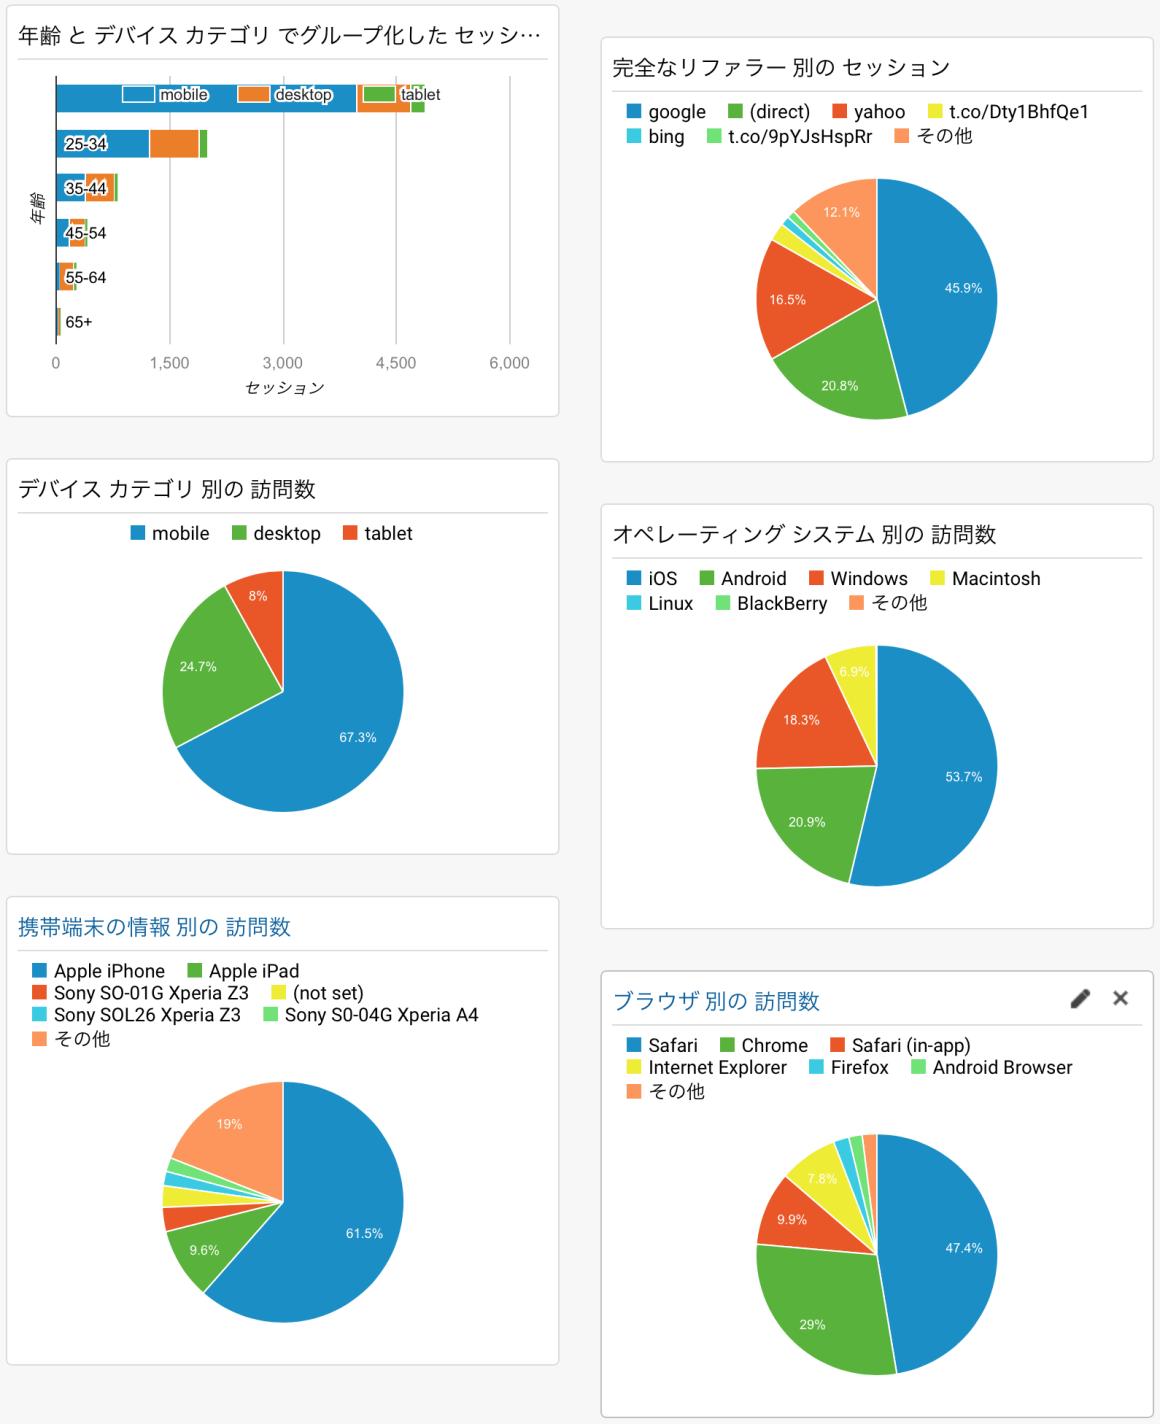 %e3%82%b9%e3%82%af%e3%83%aa%e3%83%bc%e3%83%b3%e3%82%b7%e3%83%a7%e3%83%83%e3%83%88-2016-10-21-09-34-28